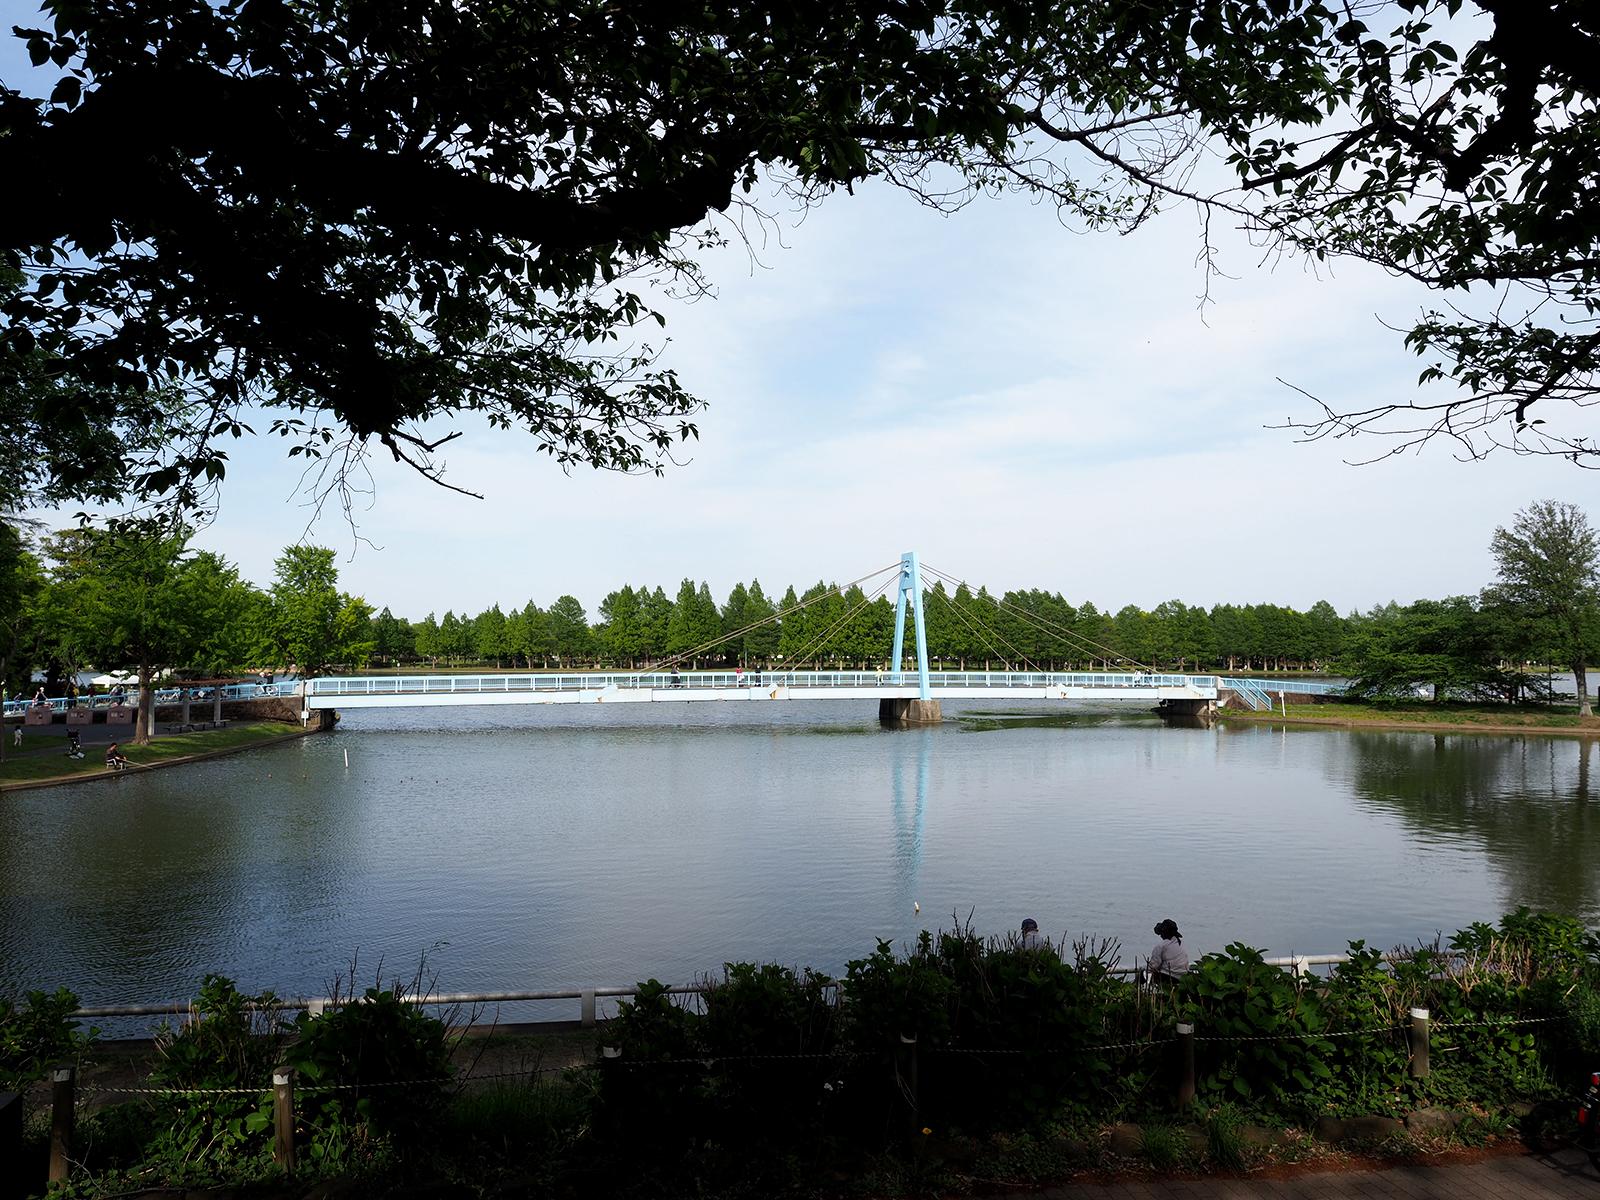 【OLYMPUS】OM-D E-M1 Mark IIで撮り歩き in 水元公園